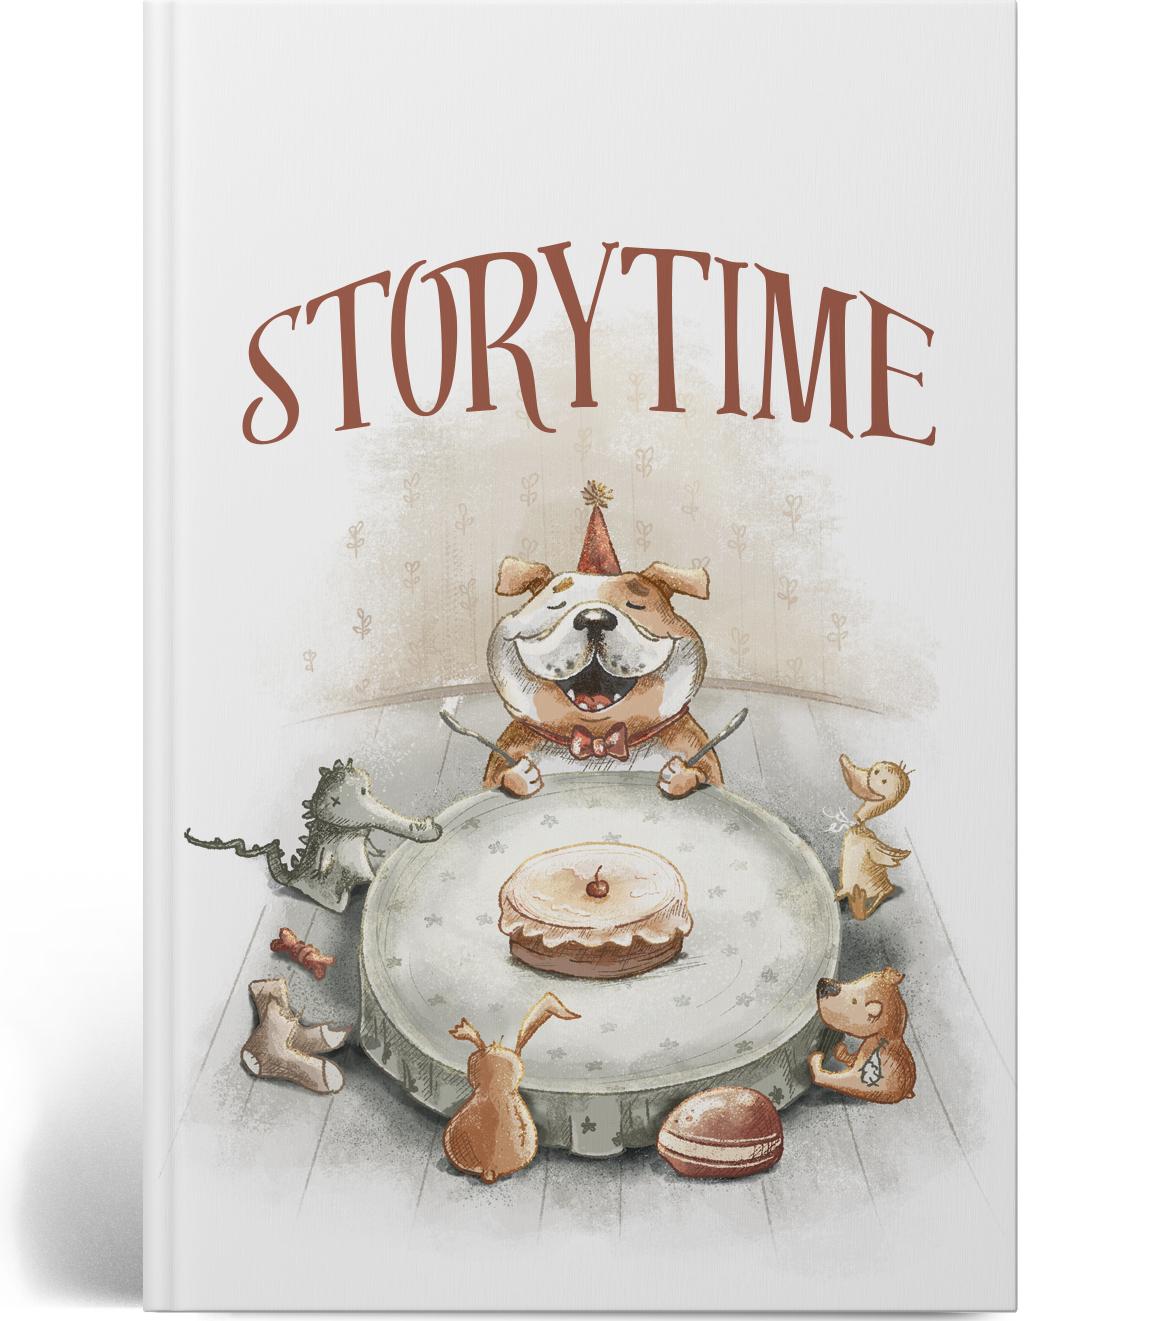 FriesenPress-Storytime-Publishing-Path